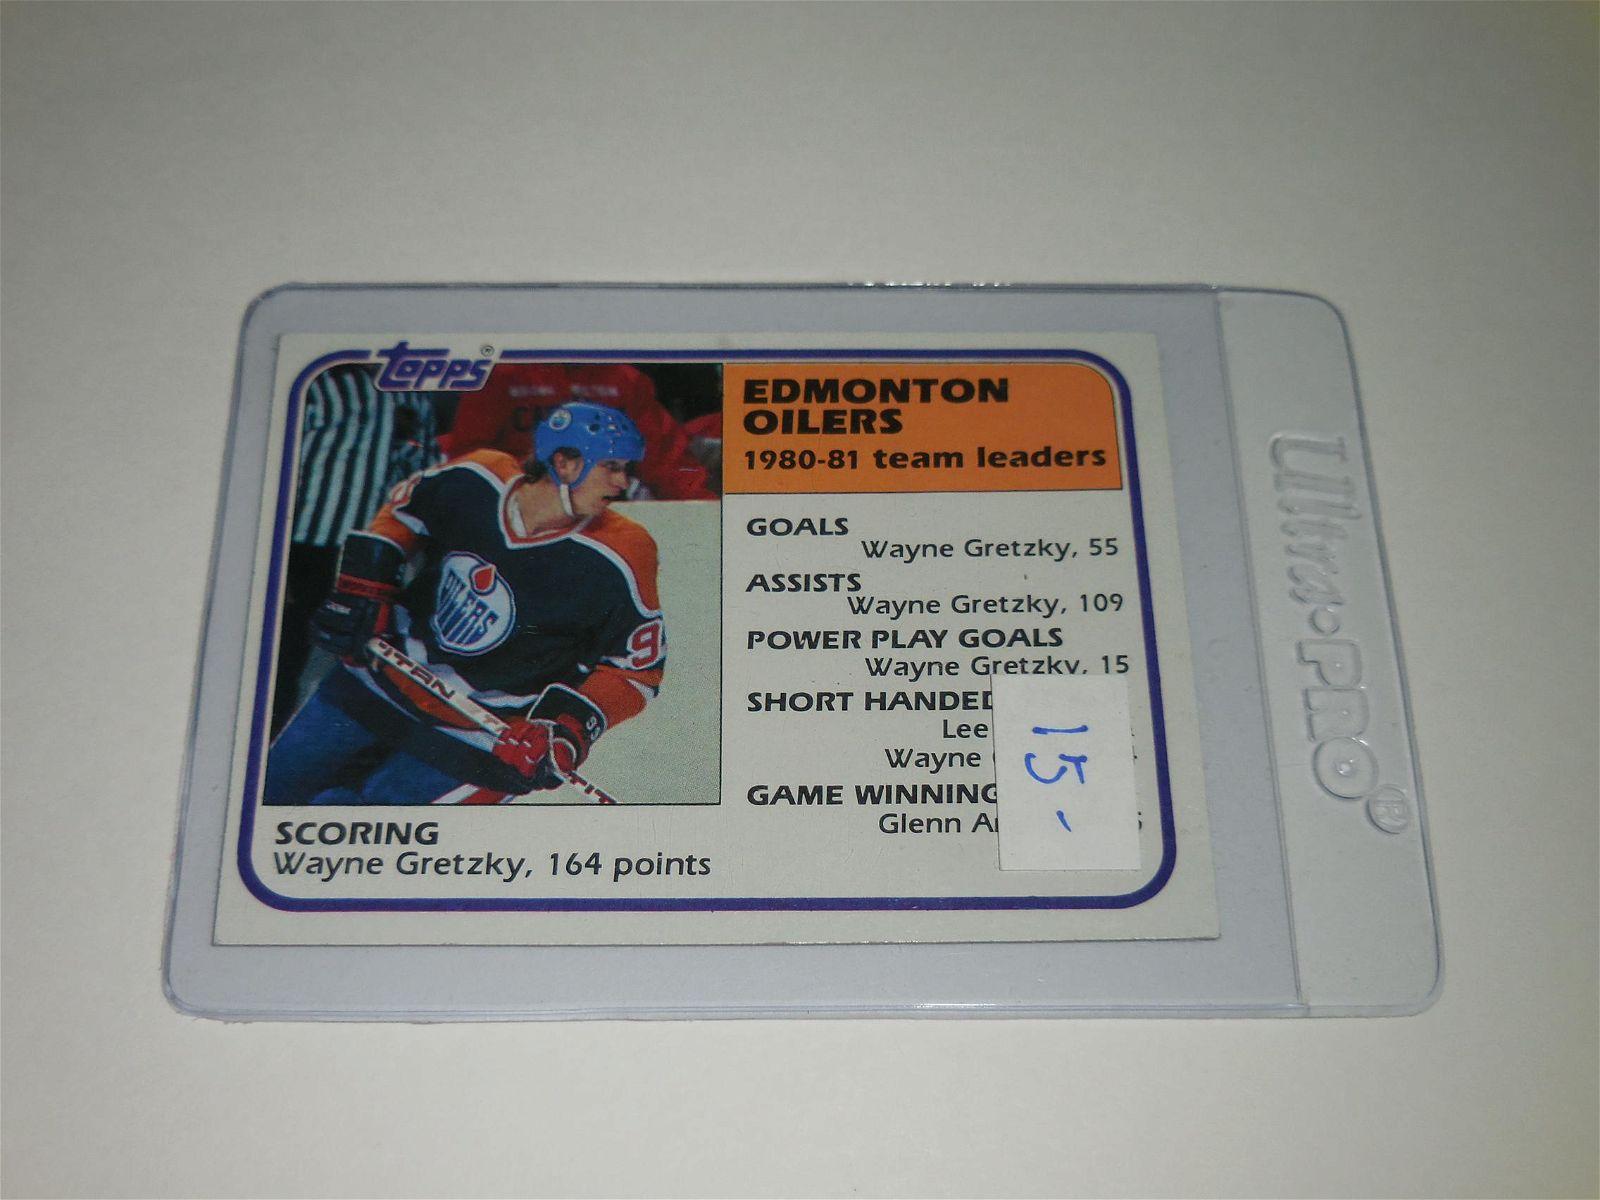 1981 TOPPS HOCKEY #52 EDMONTON OILERS WAYNE GRETZKY